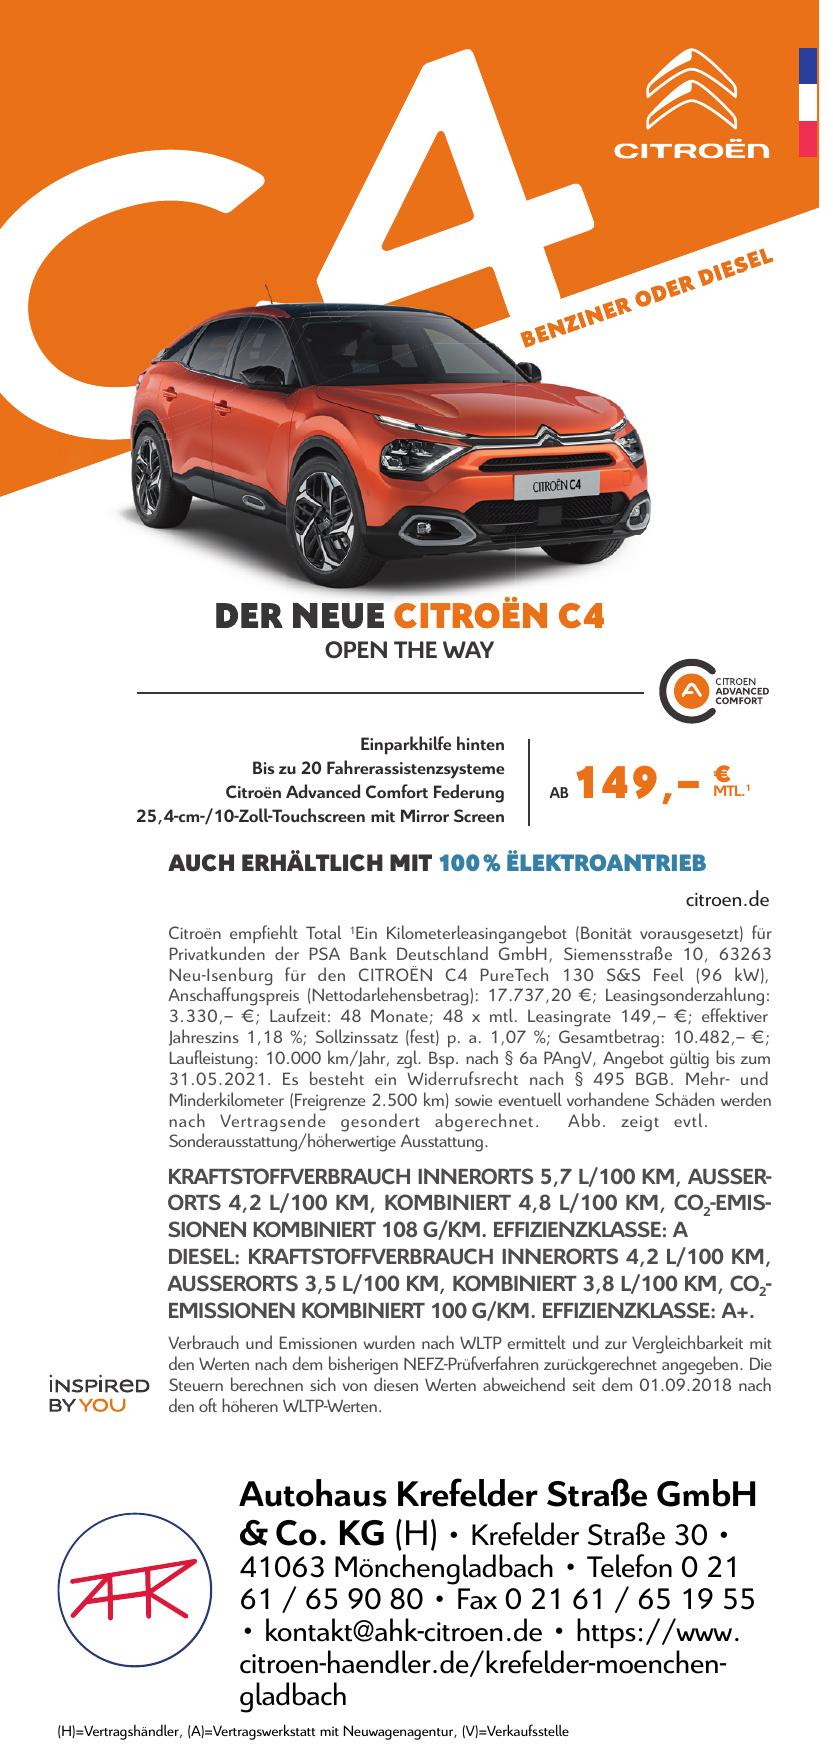 Autohaus Krefelder Straße GmbH & Co. KG (H)